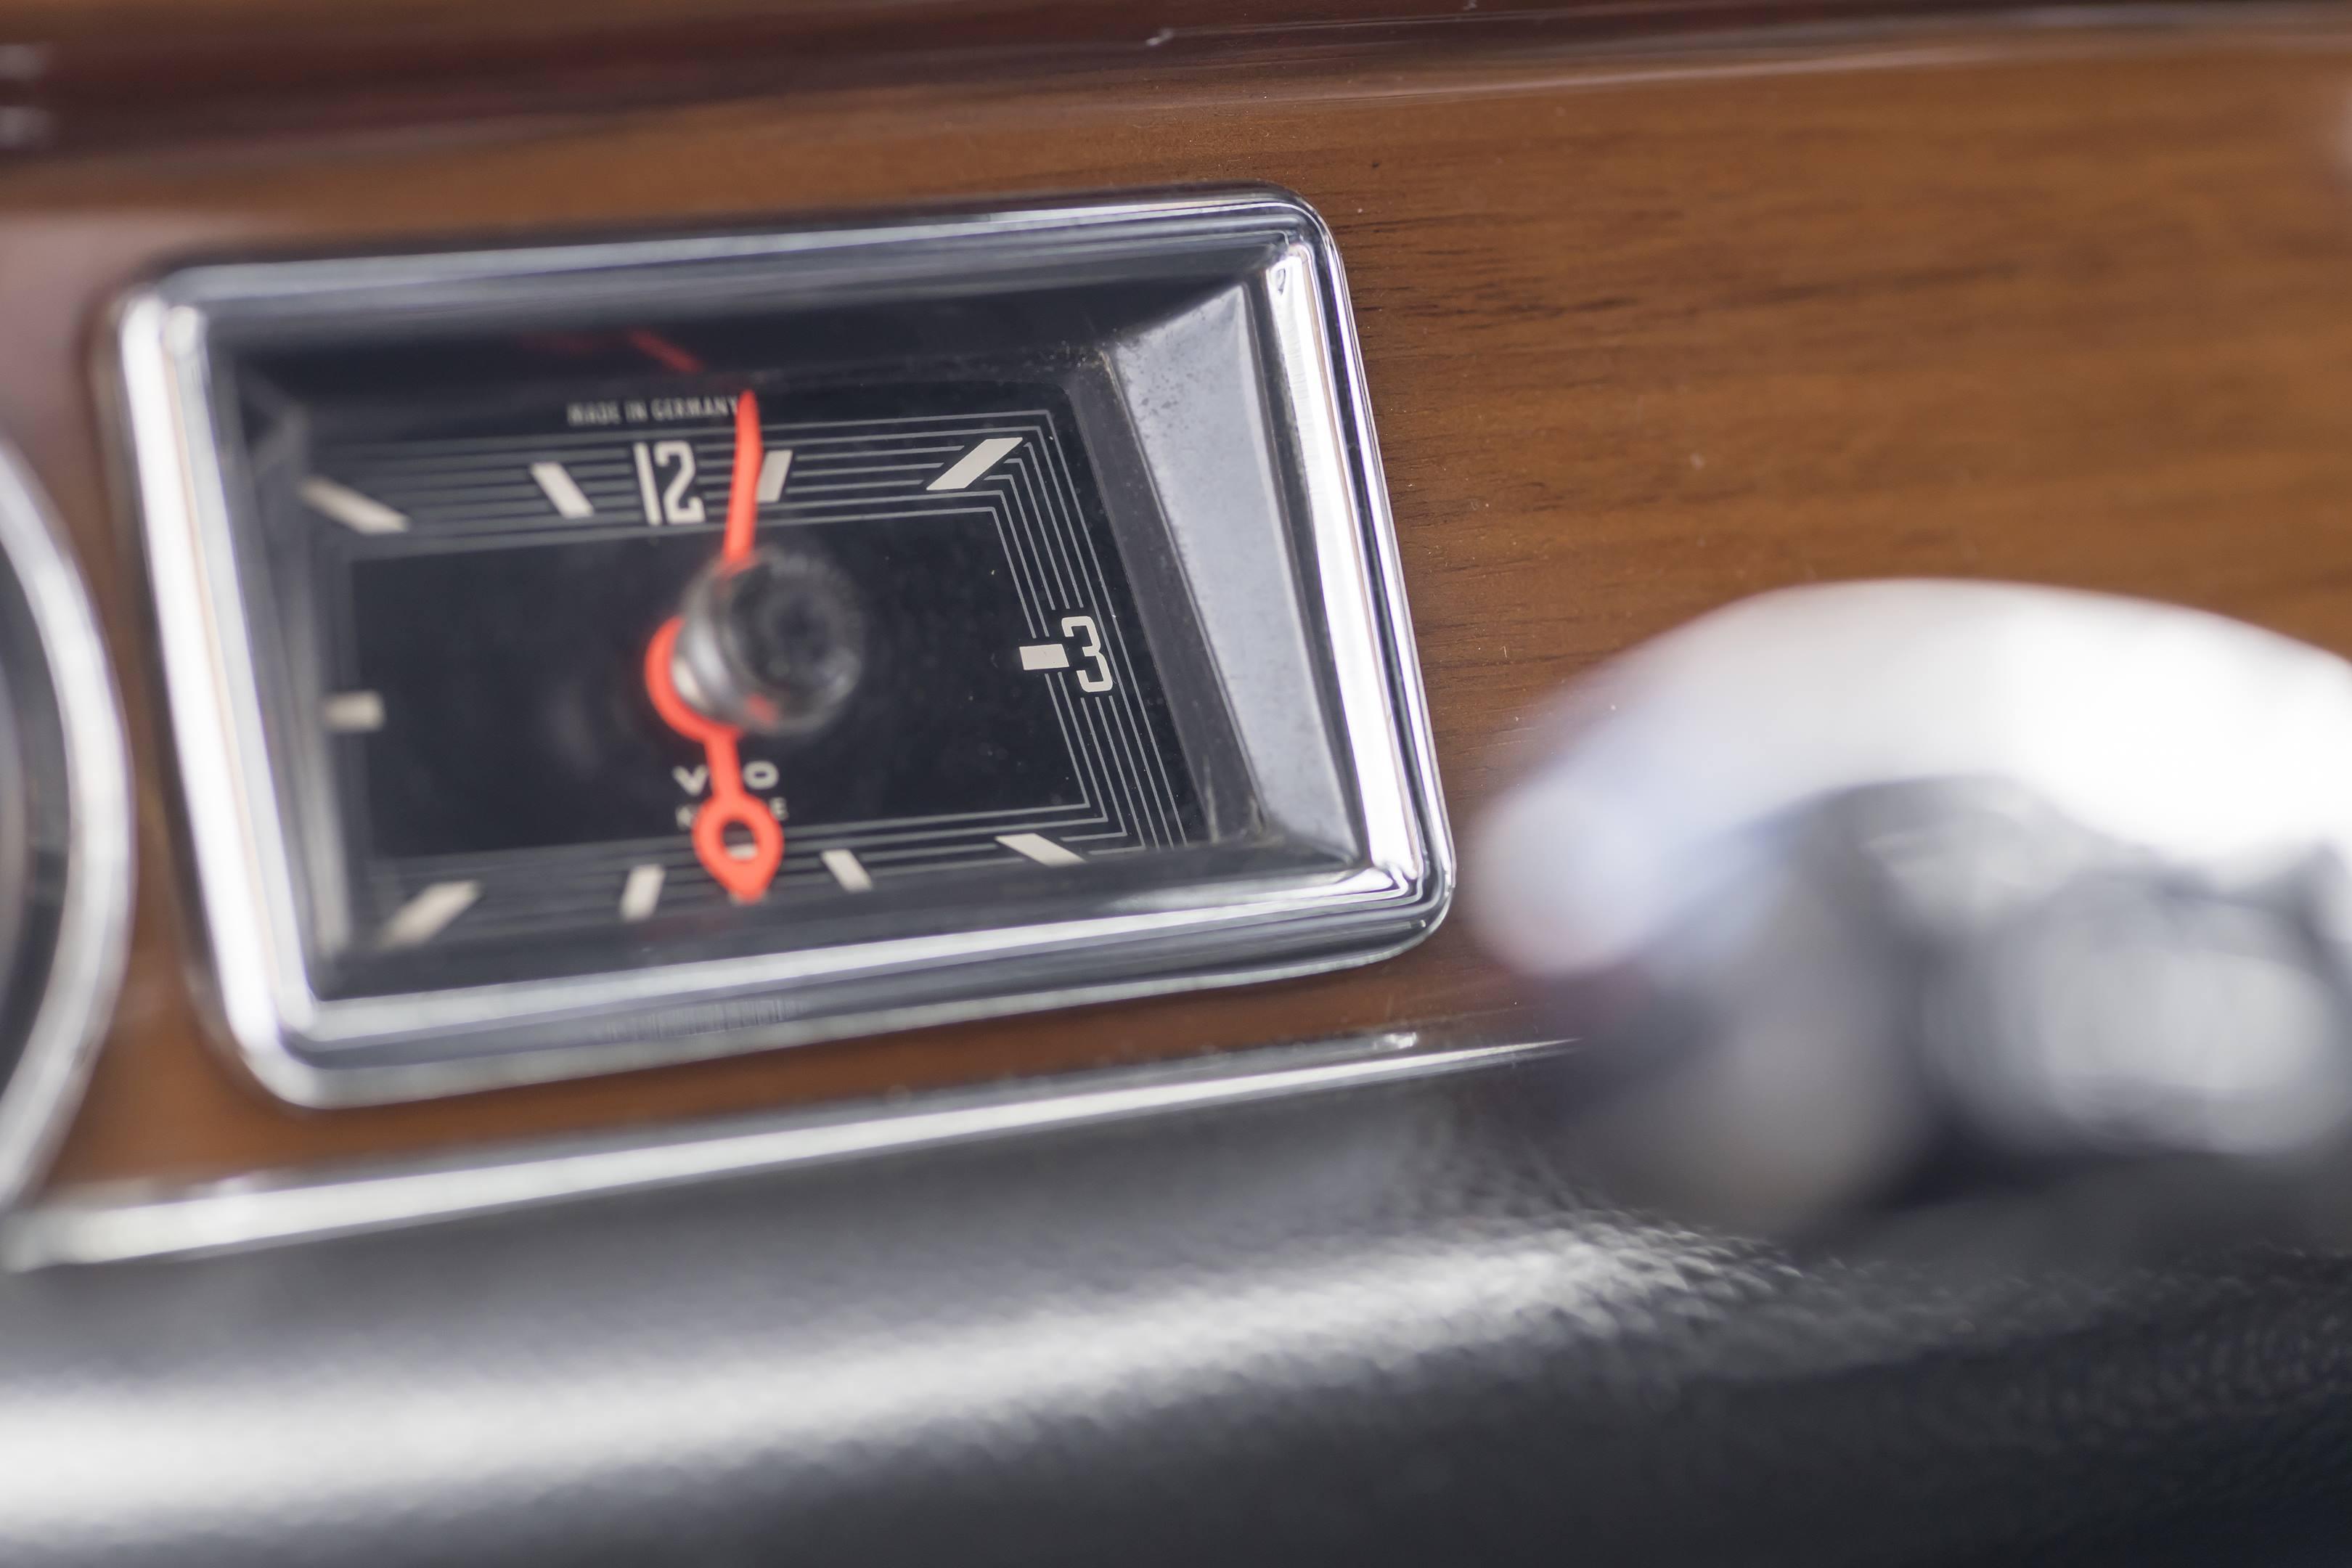 mercedes benz amg 300SEL 6.3 rectangular clock